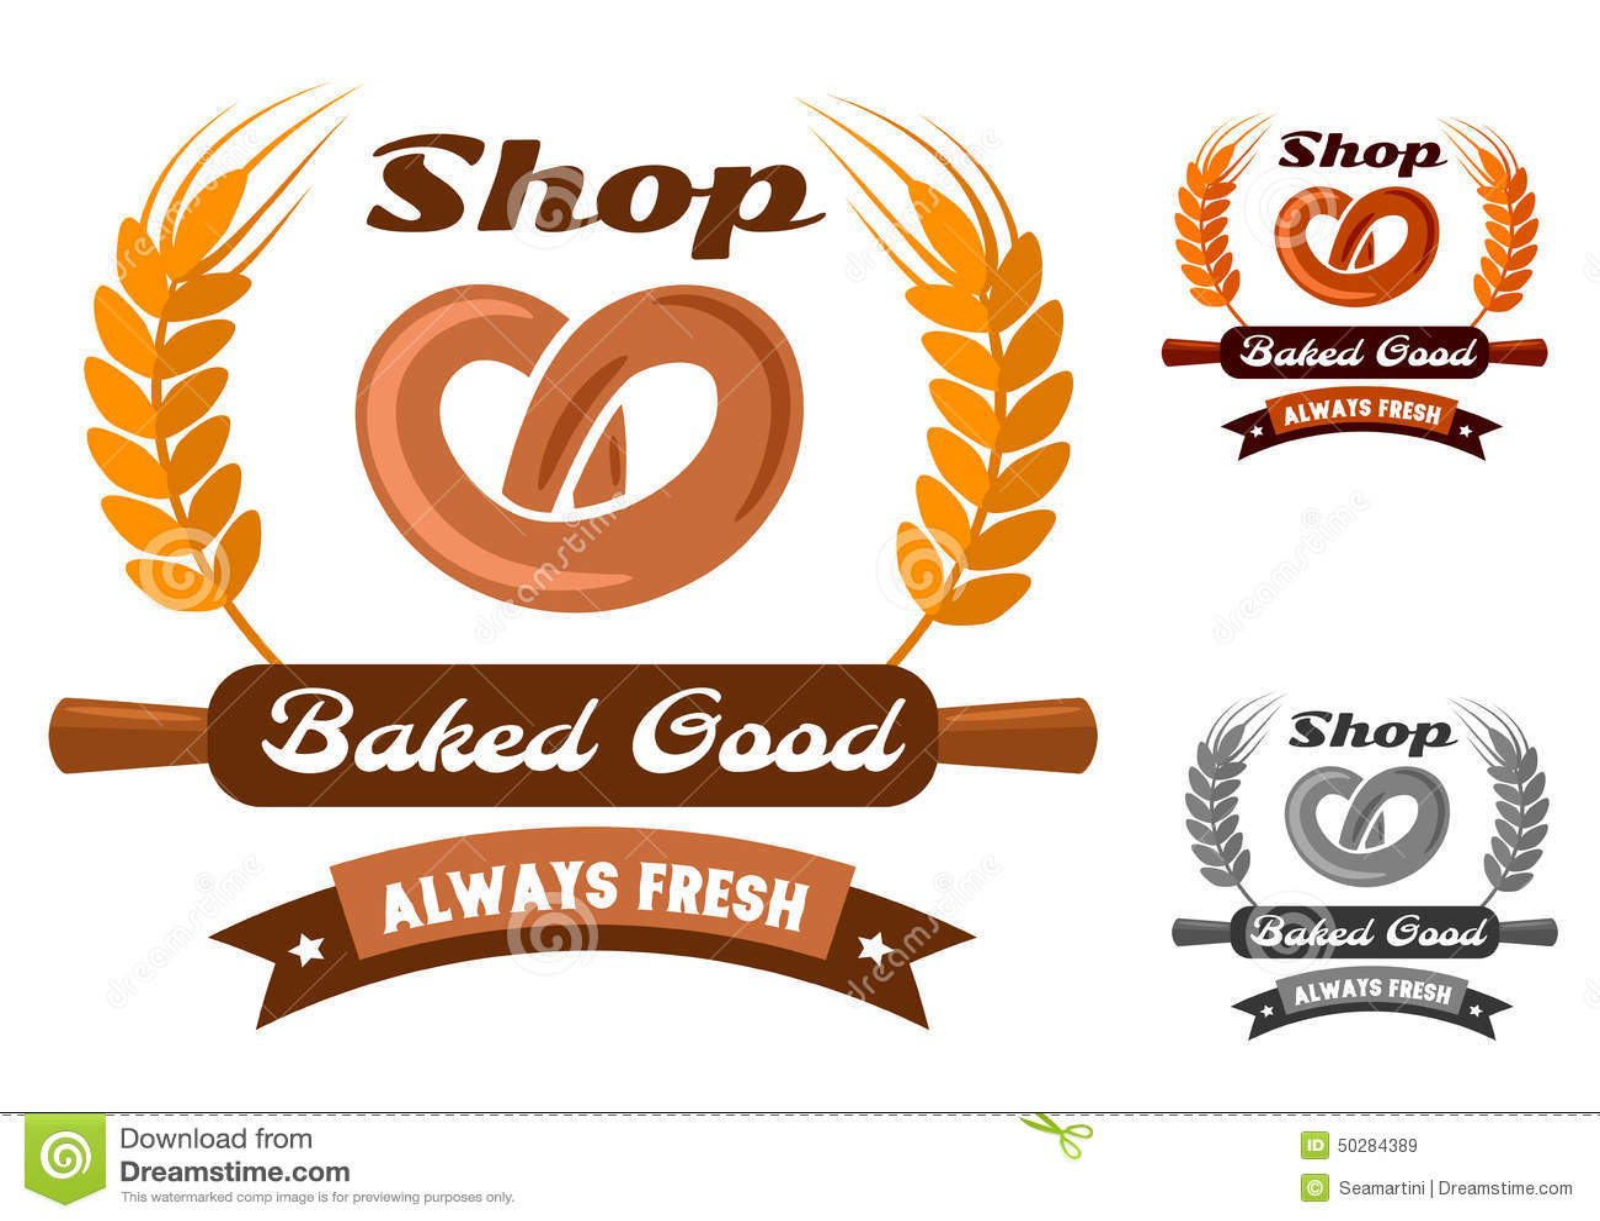 Bakery Cafe Logos